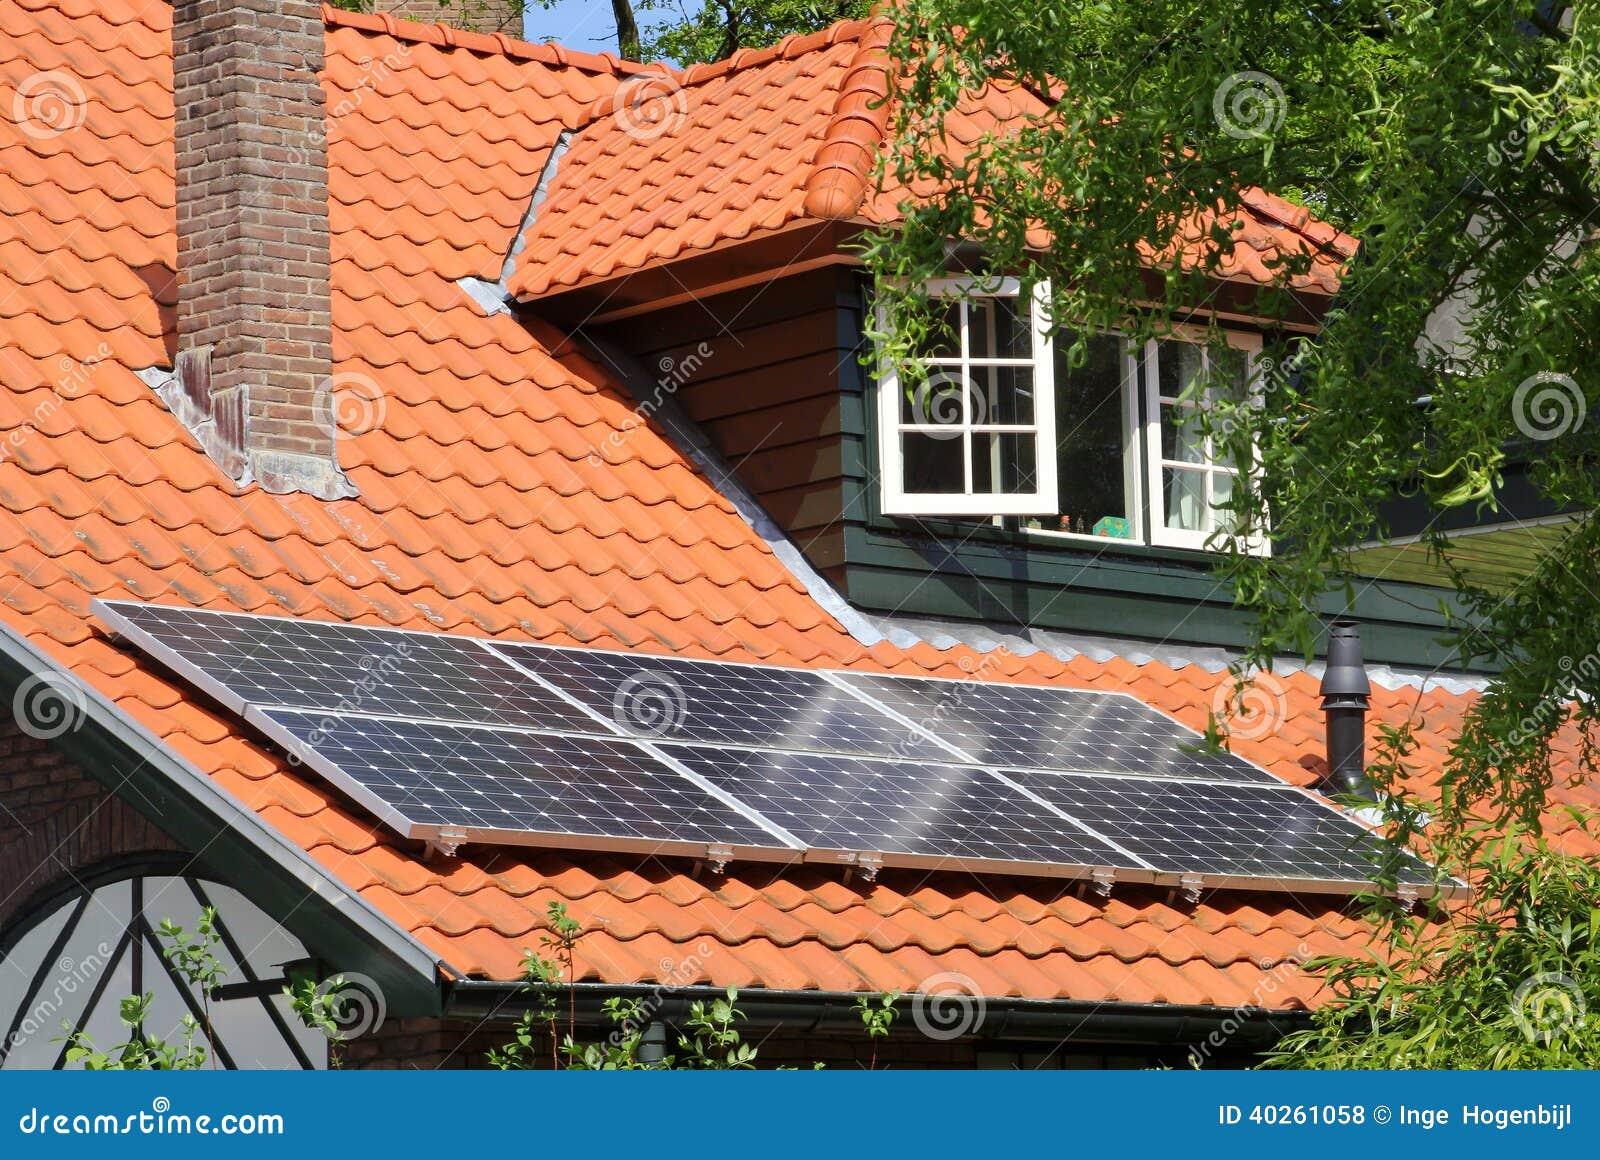 Modern solar panels as an alternative energy source on for Modern house tiles